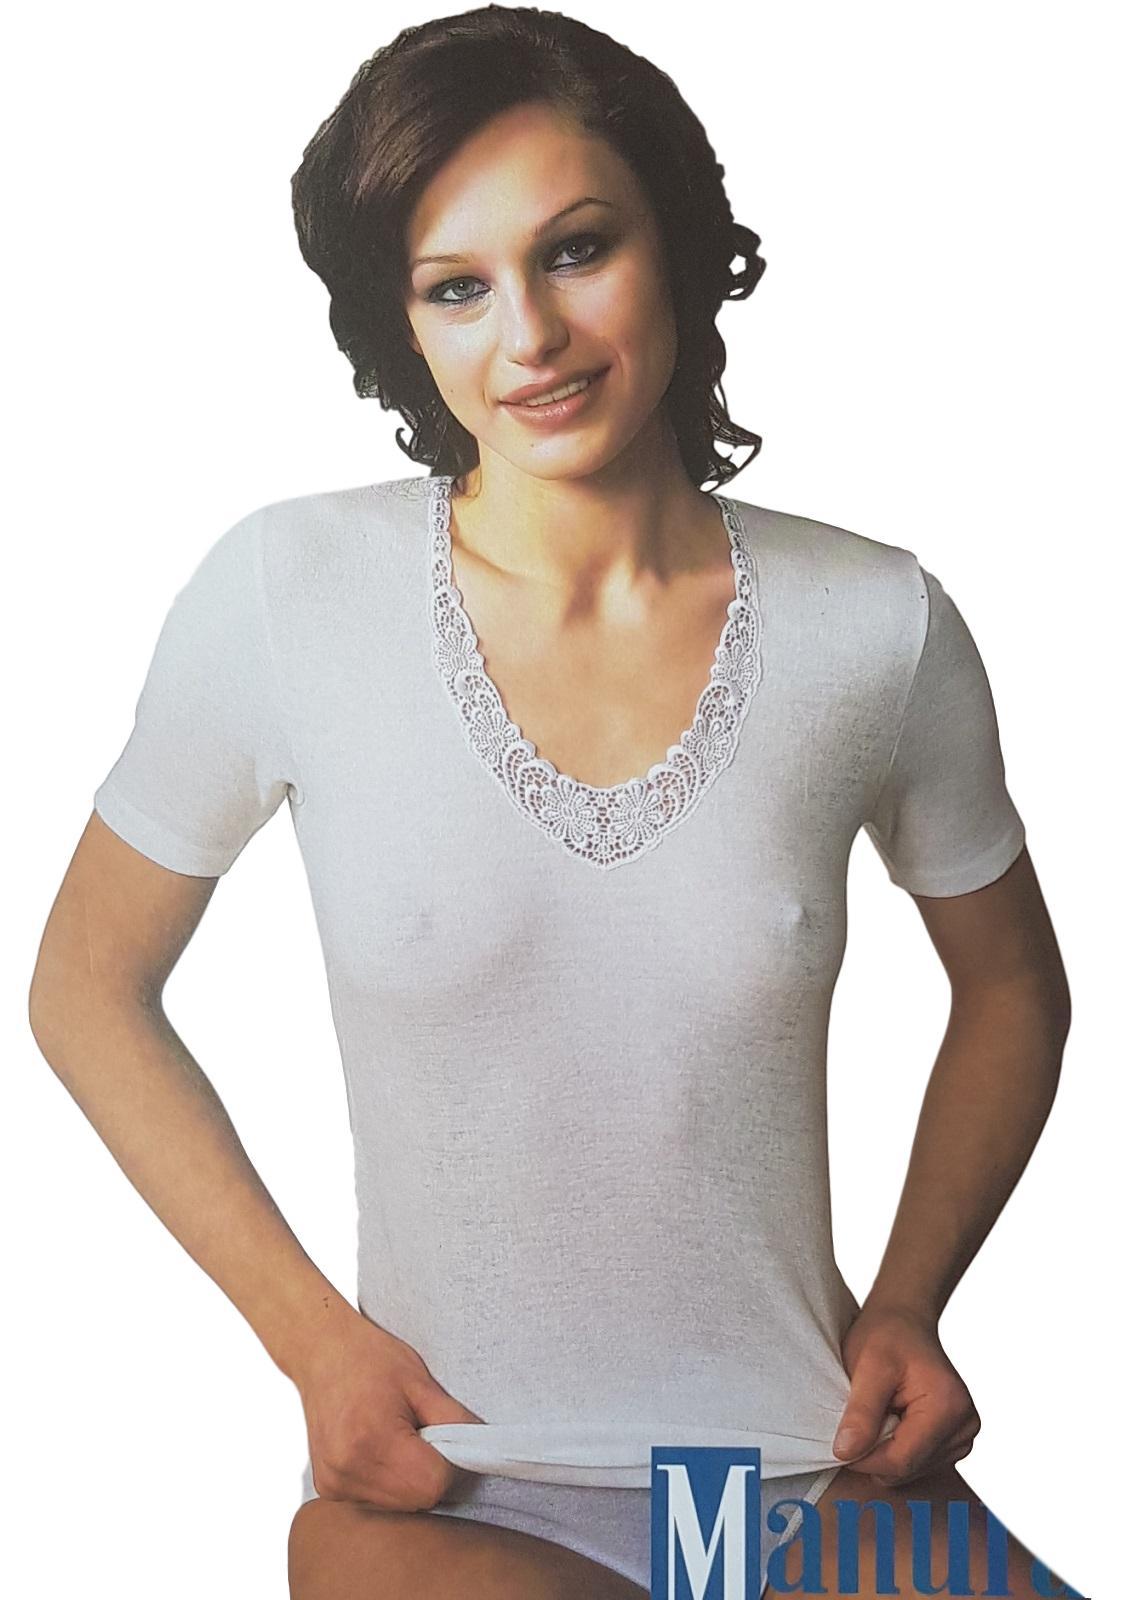 T-Shirt donna, maglietta a mezza manica Lana e Cotone Senza Cuciture MANUFAT 824